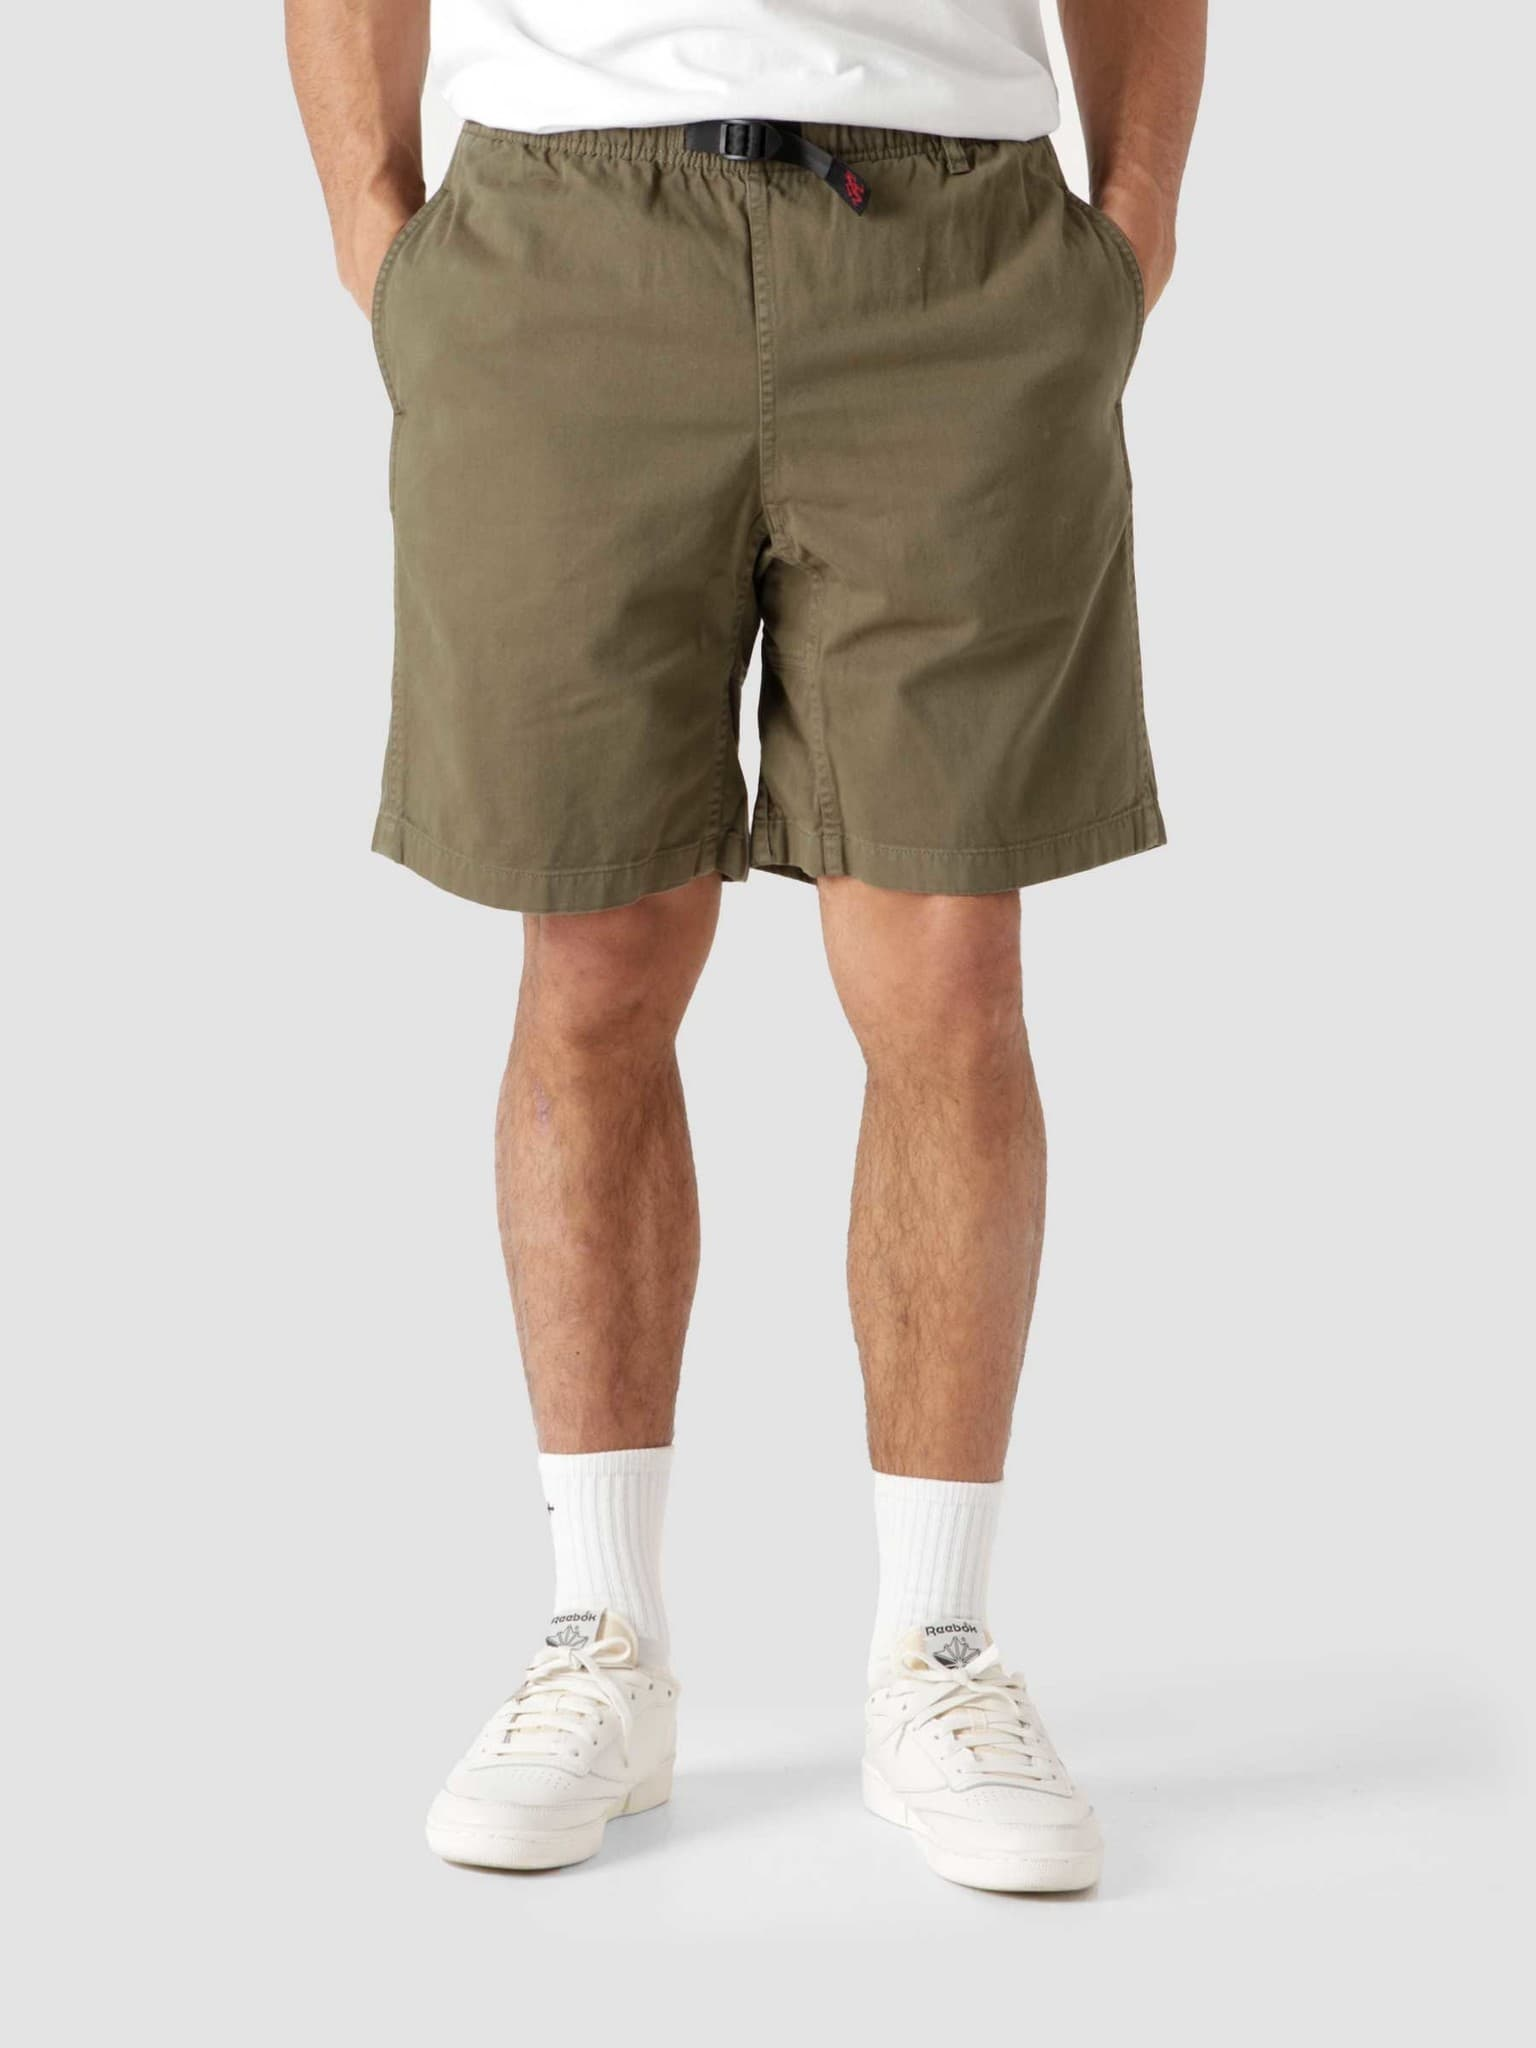 G Shorts Olive 8117-56J